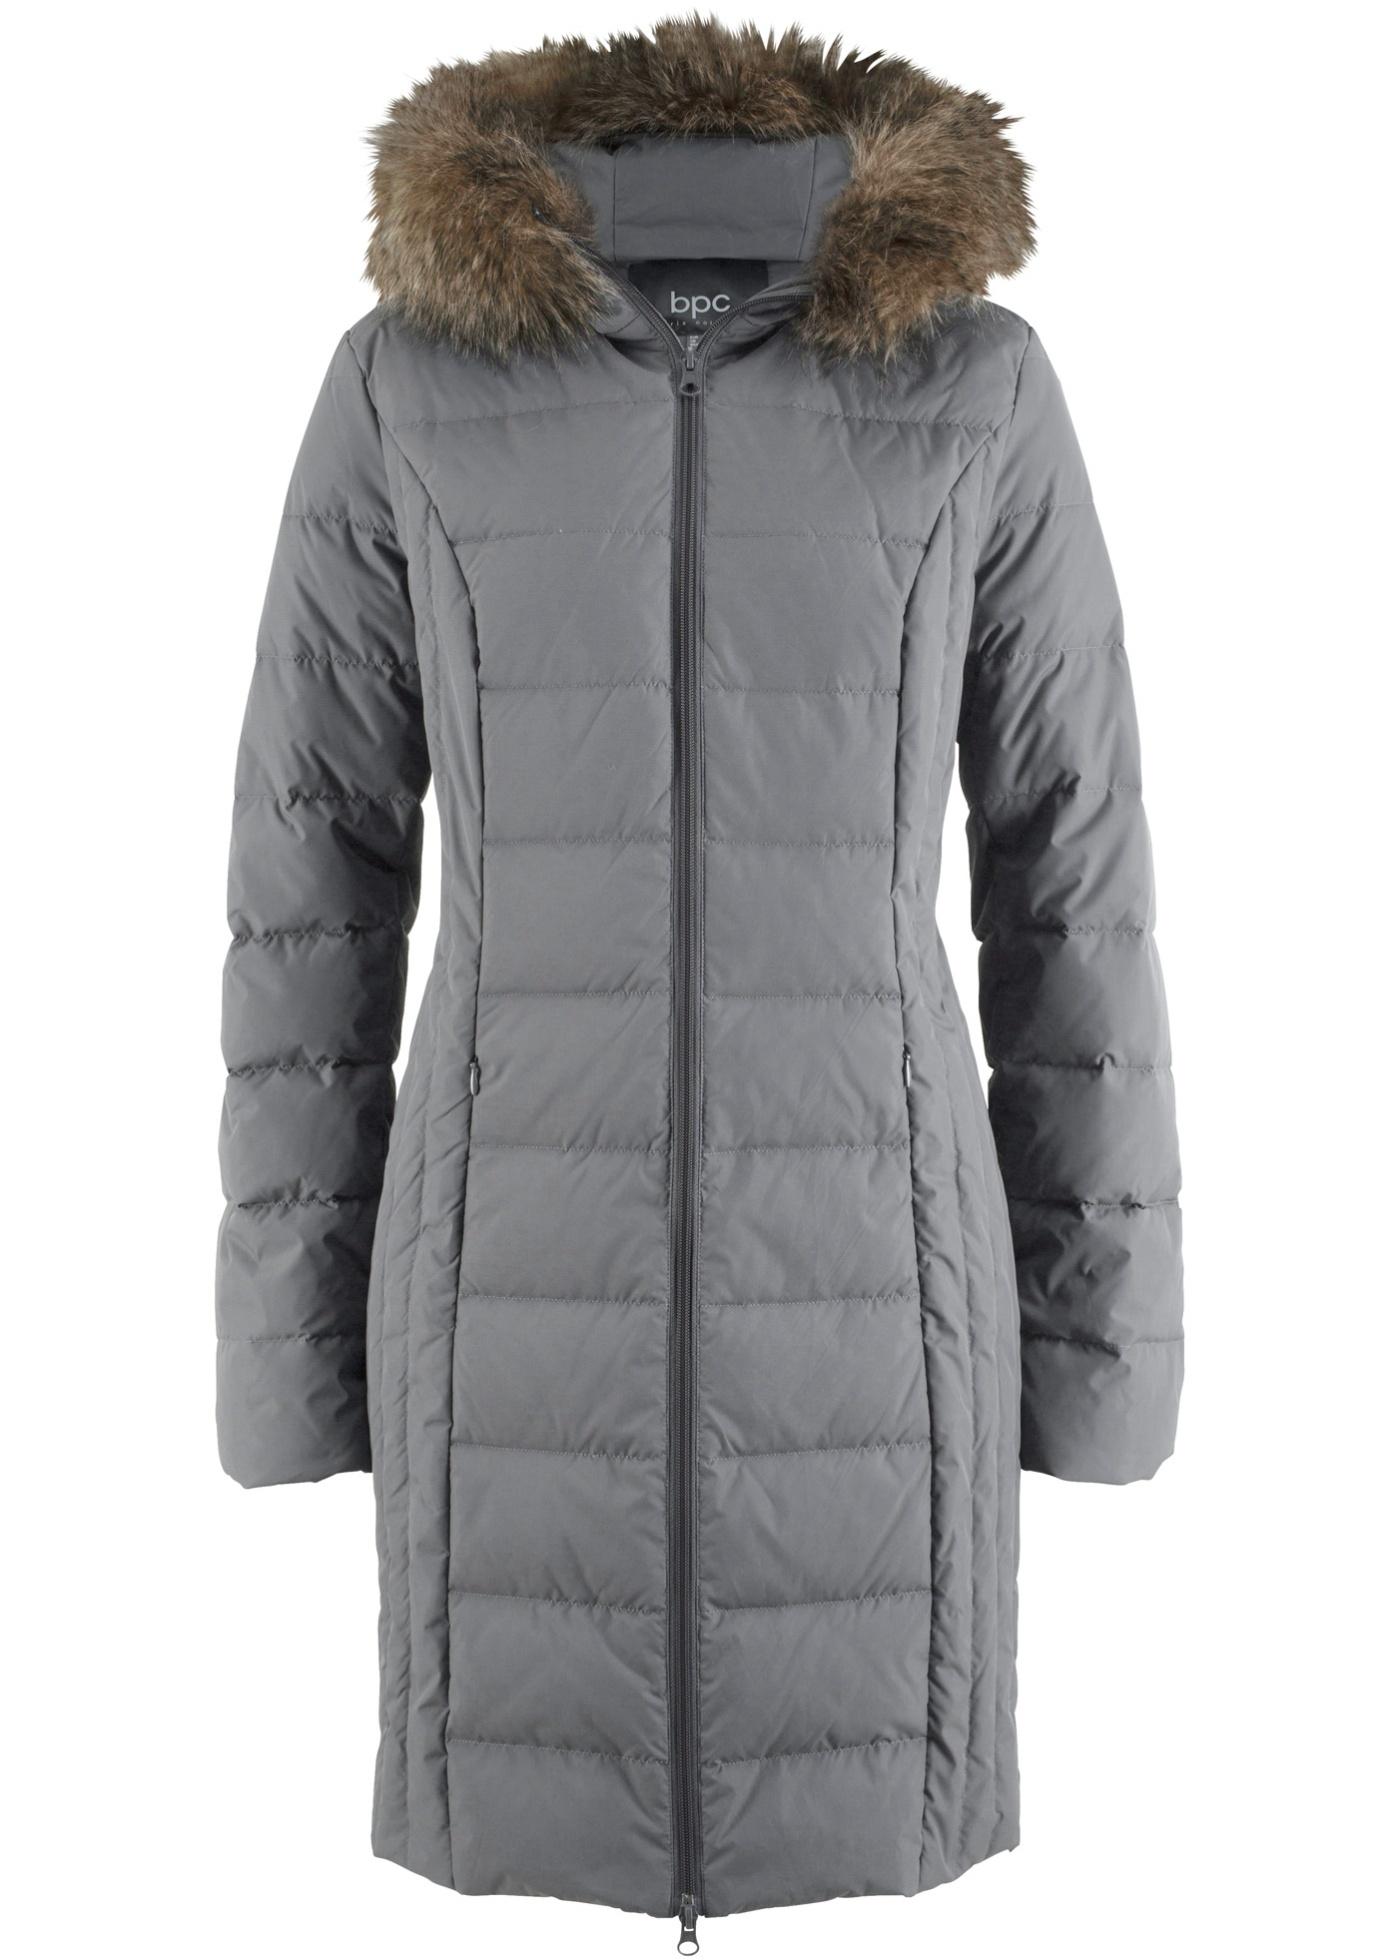 Prošívaný péřový kabát - Šedá